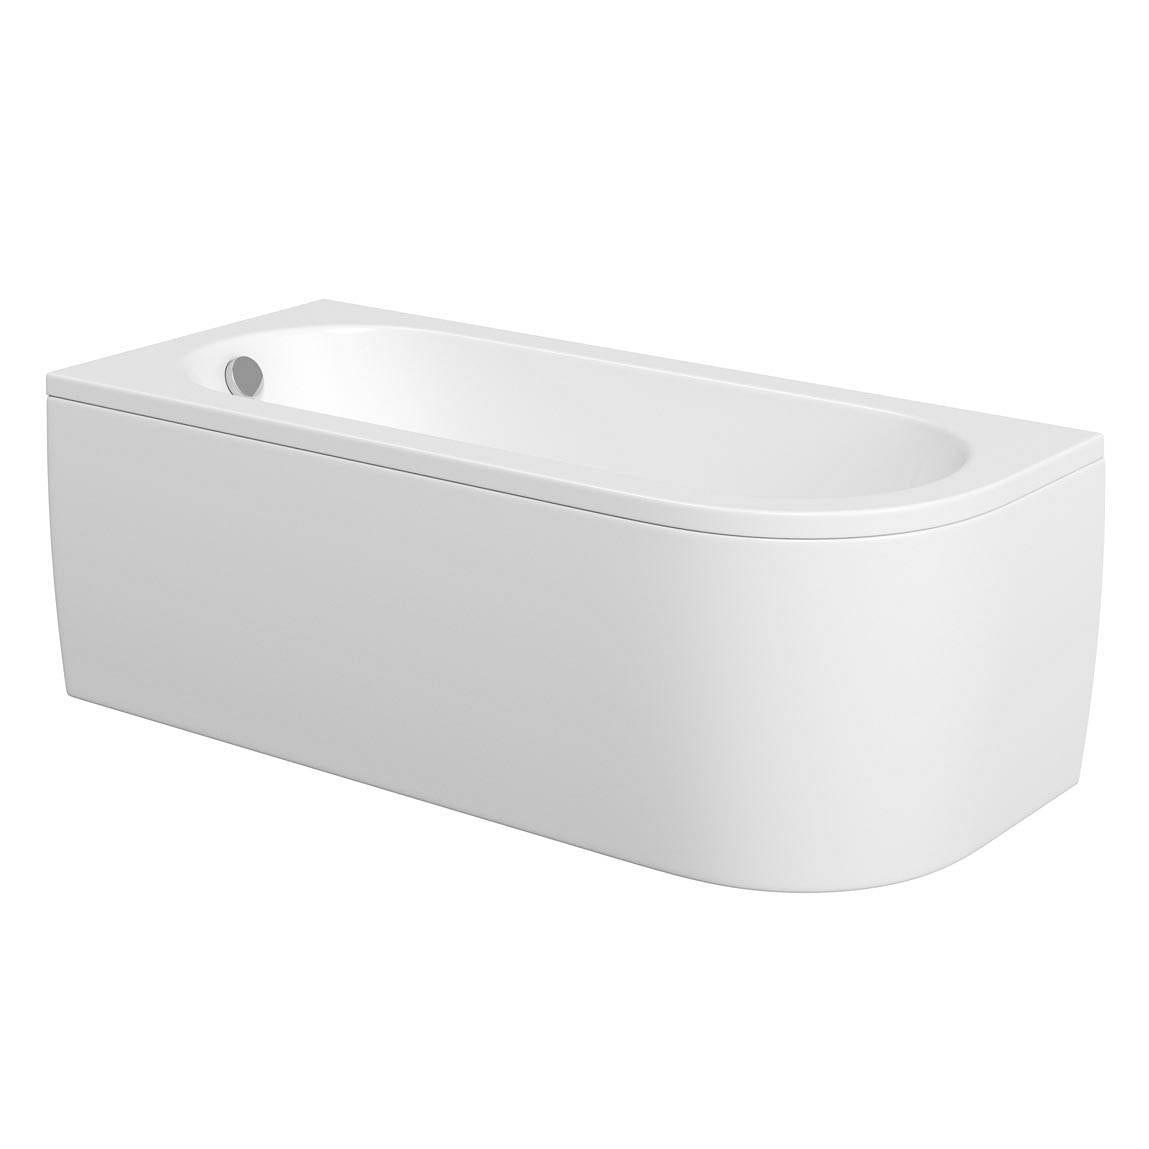 Mode Cayman D shaped left handed single ended bath